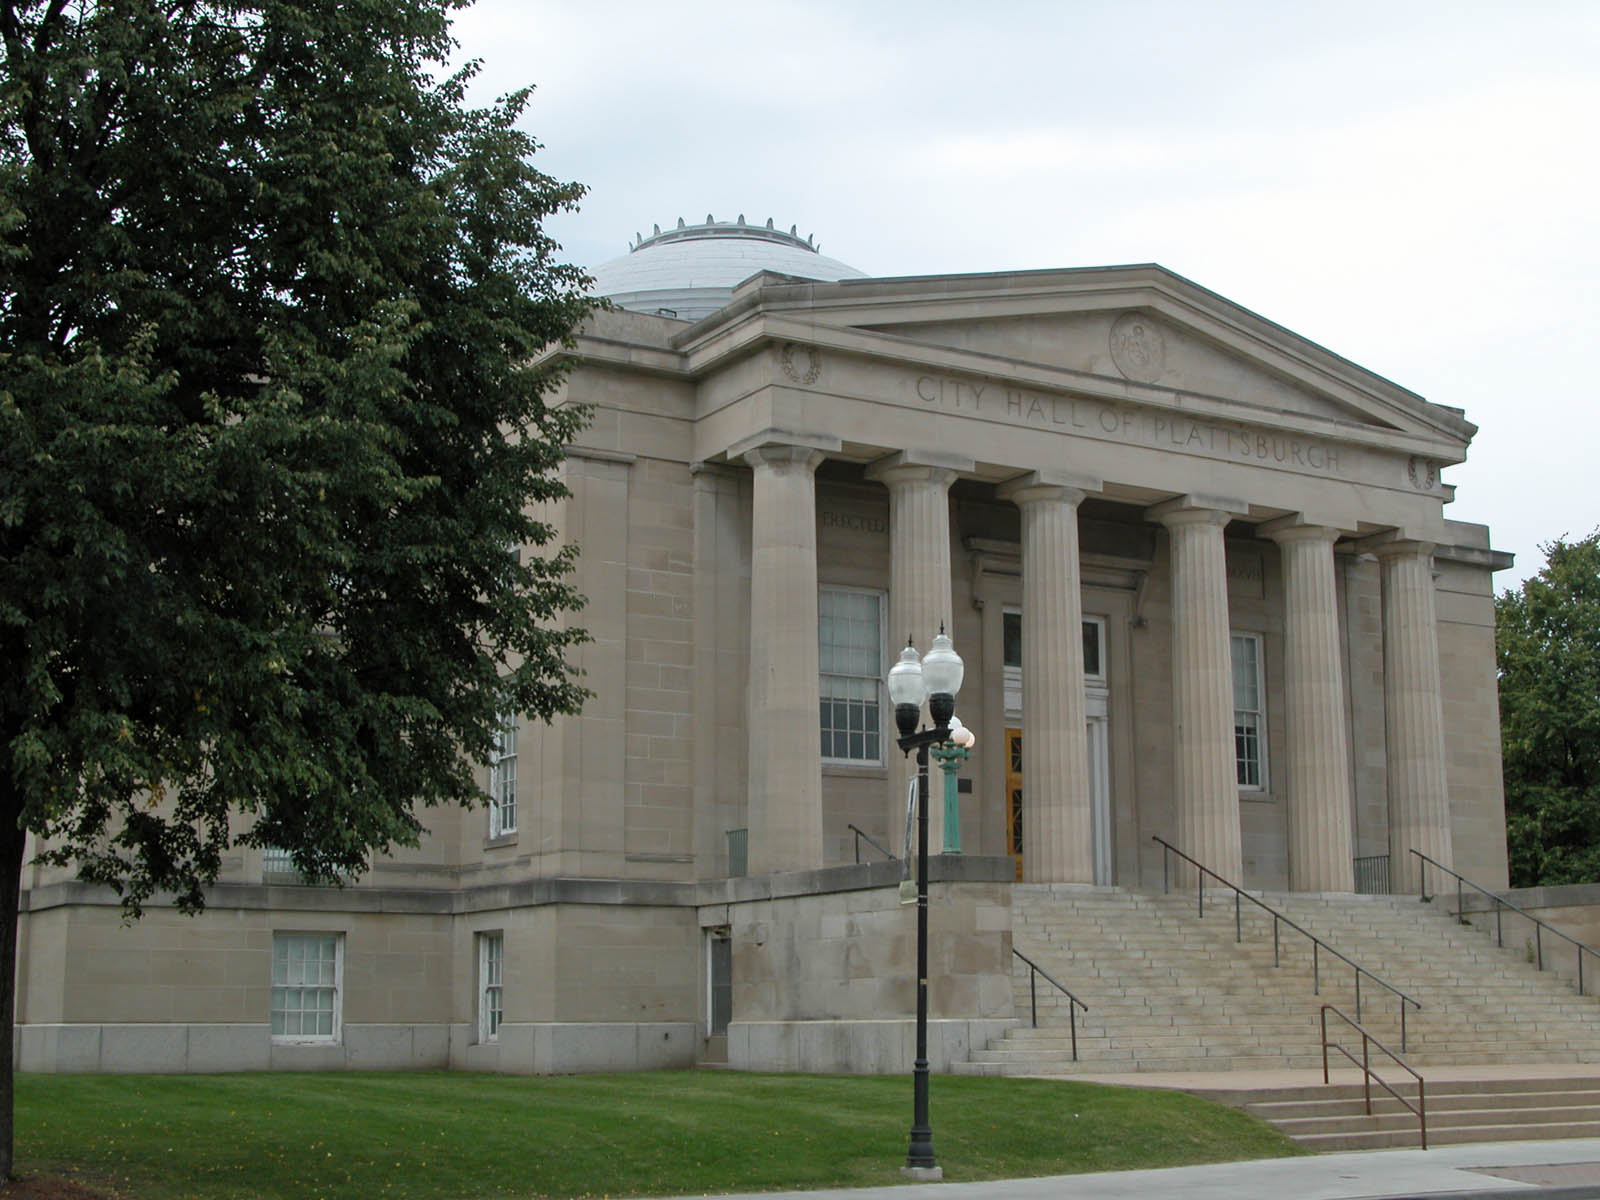 Plattsburgh Officials Discuss Implications Of Utility Shutoffs Post-COVID